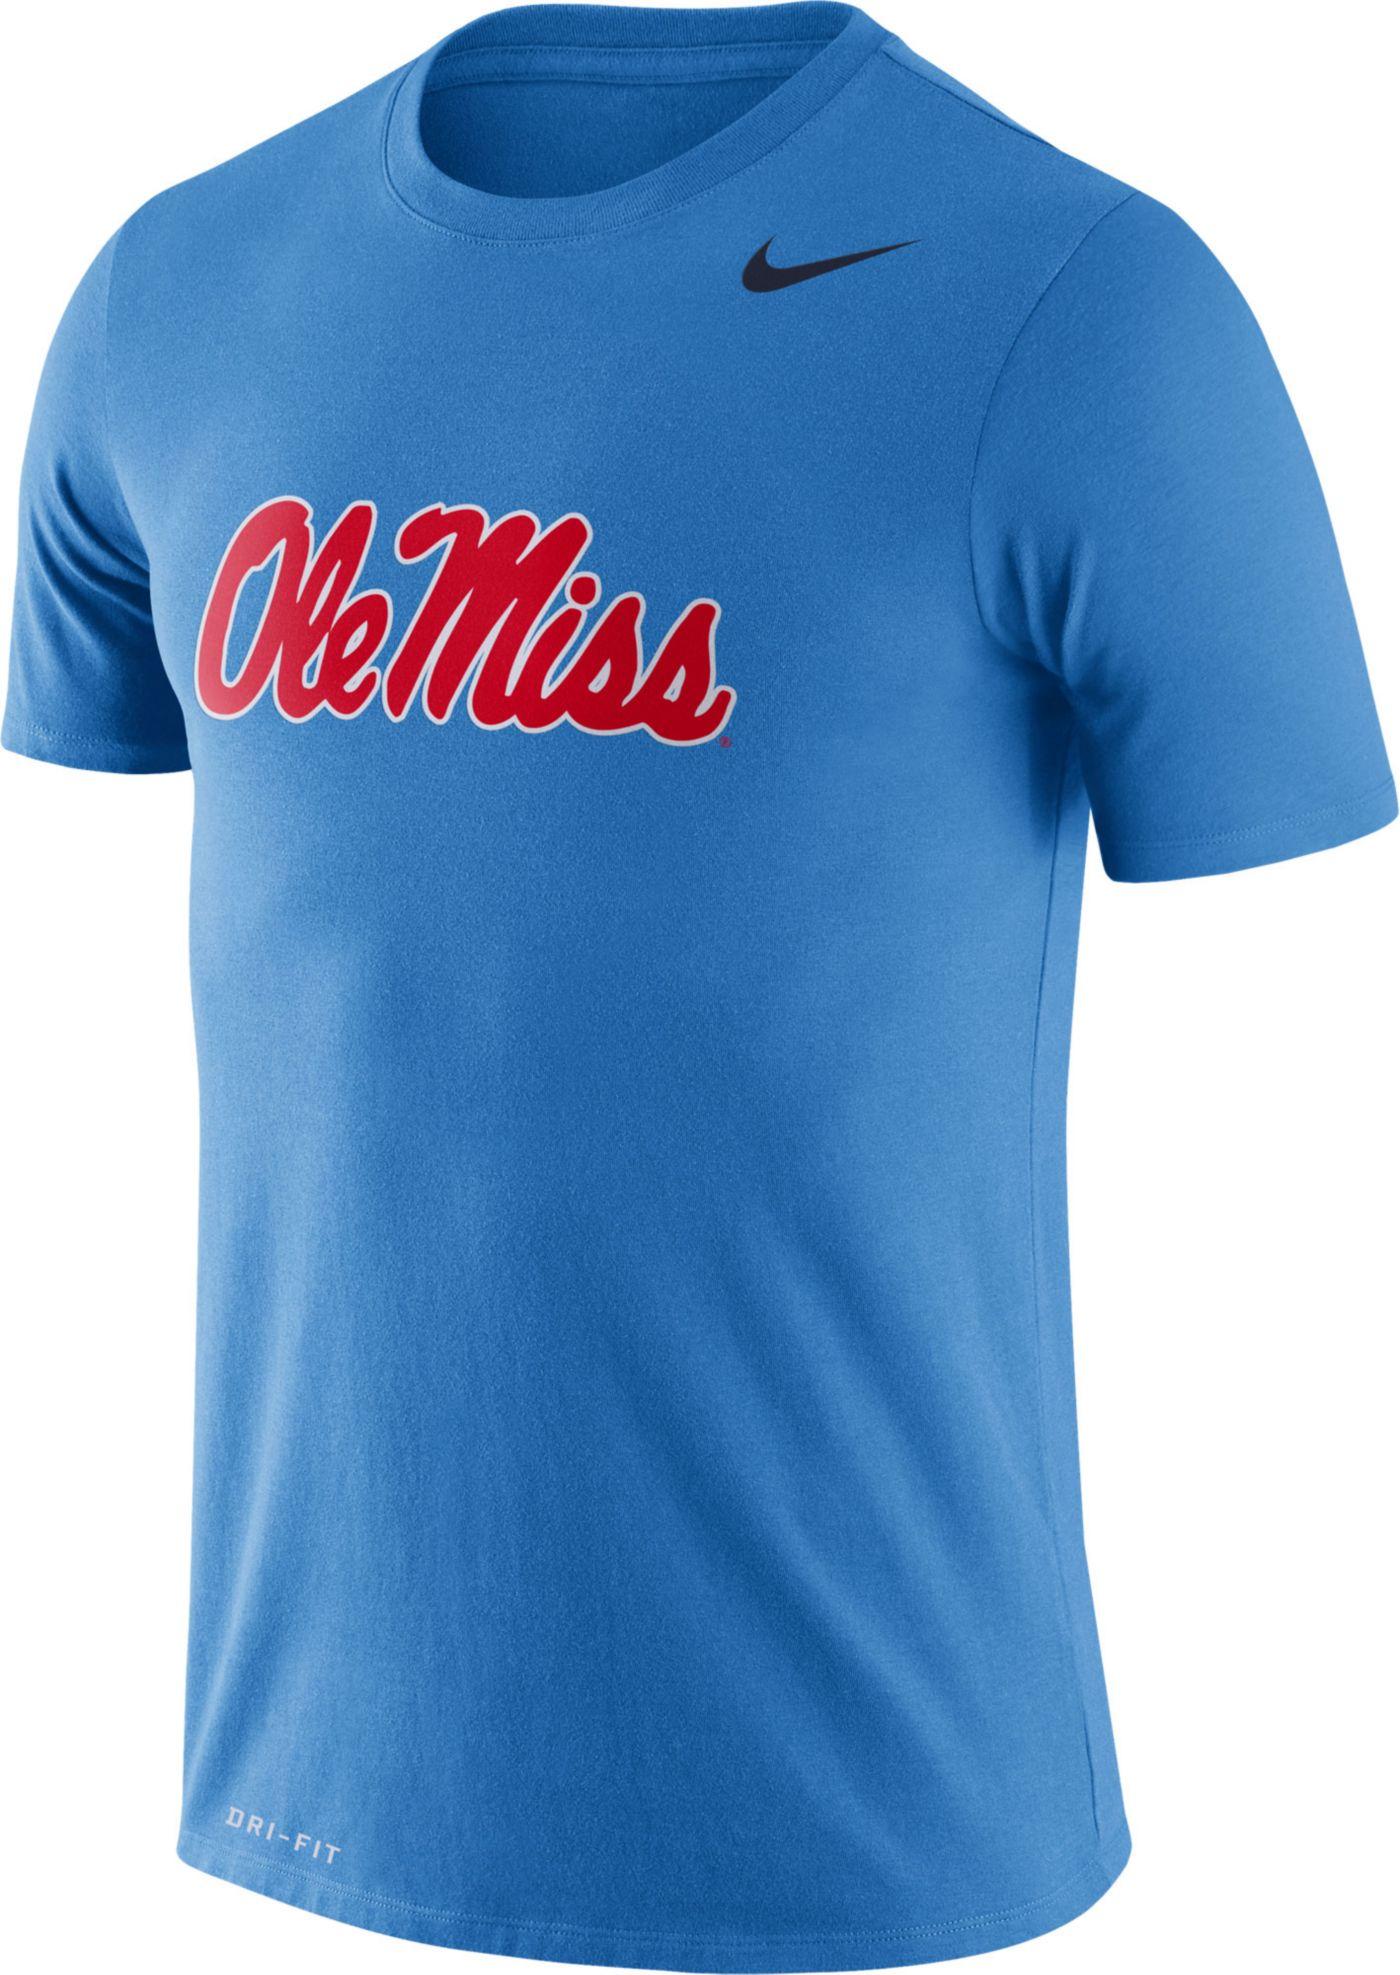 Nike Men's Ole Miss Rebels Blue Logo Dry Legend T-Shirt